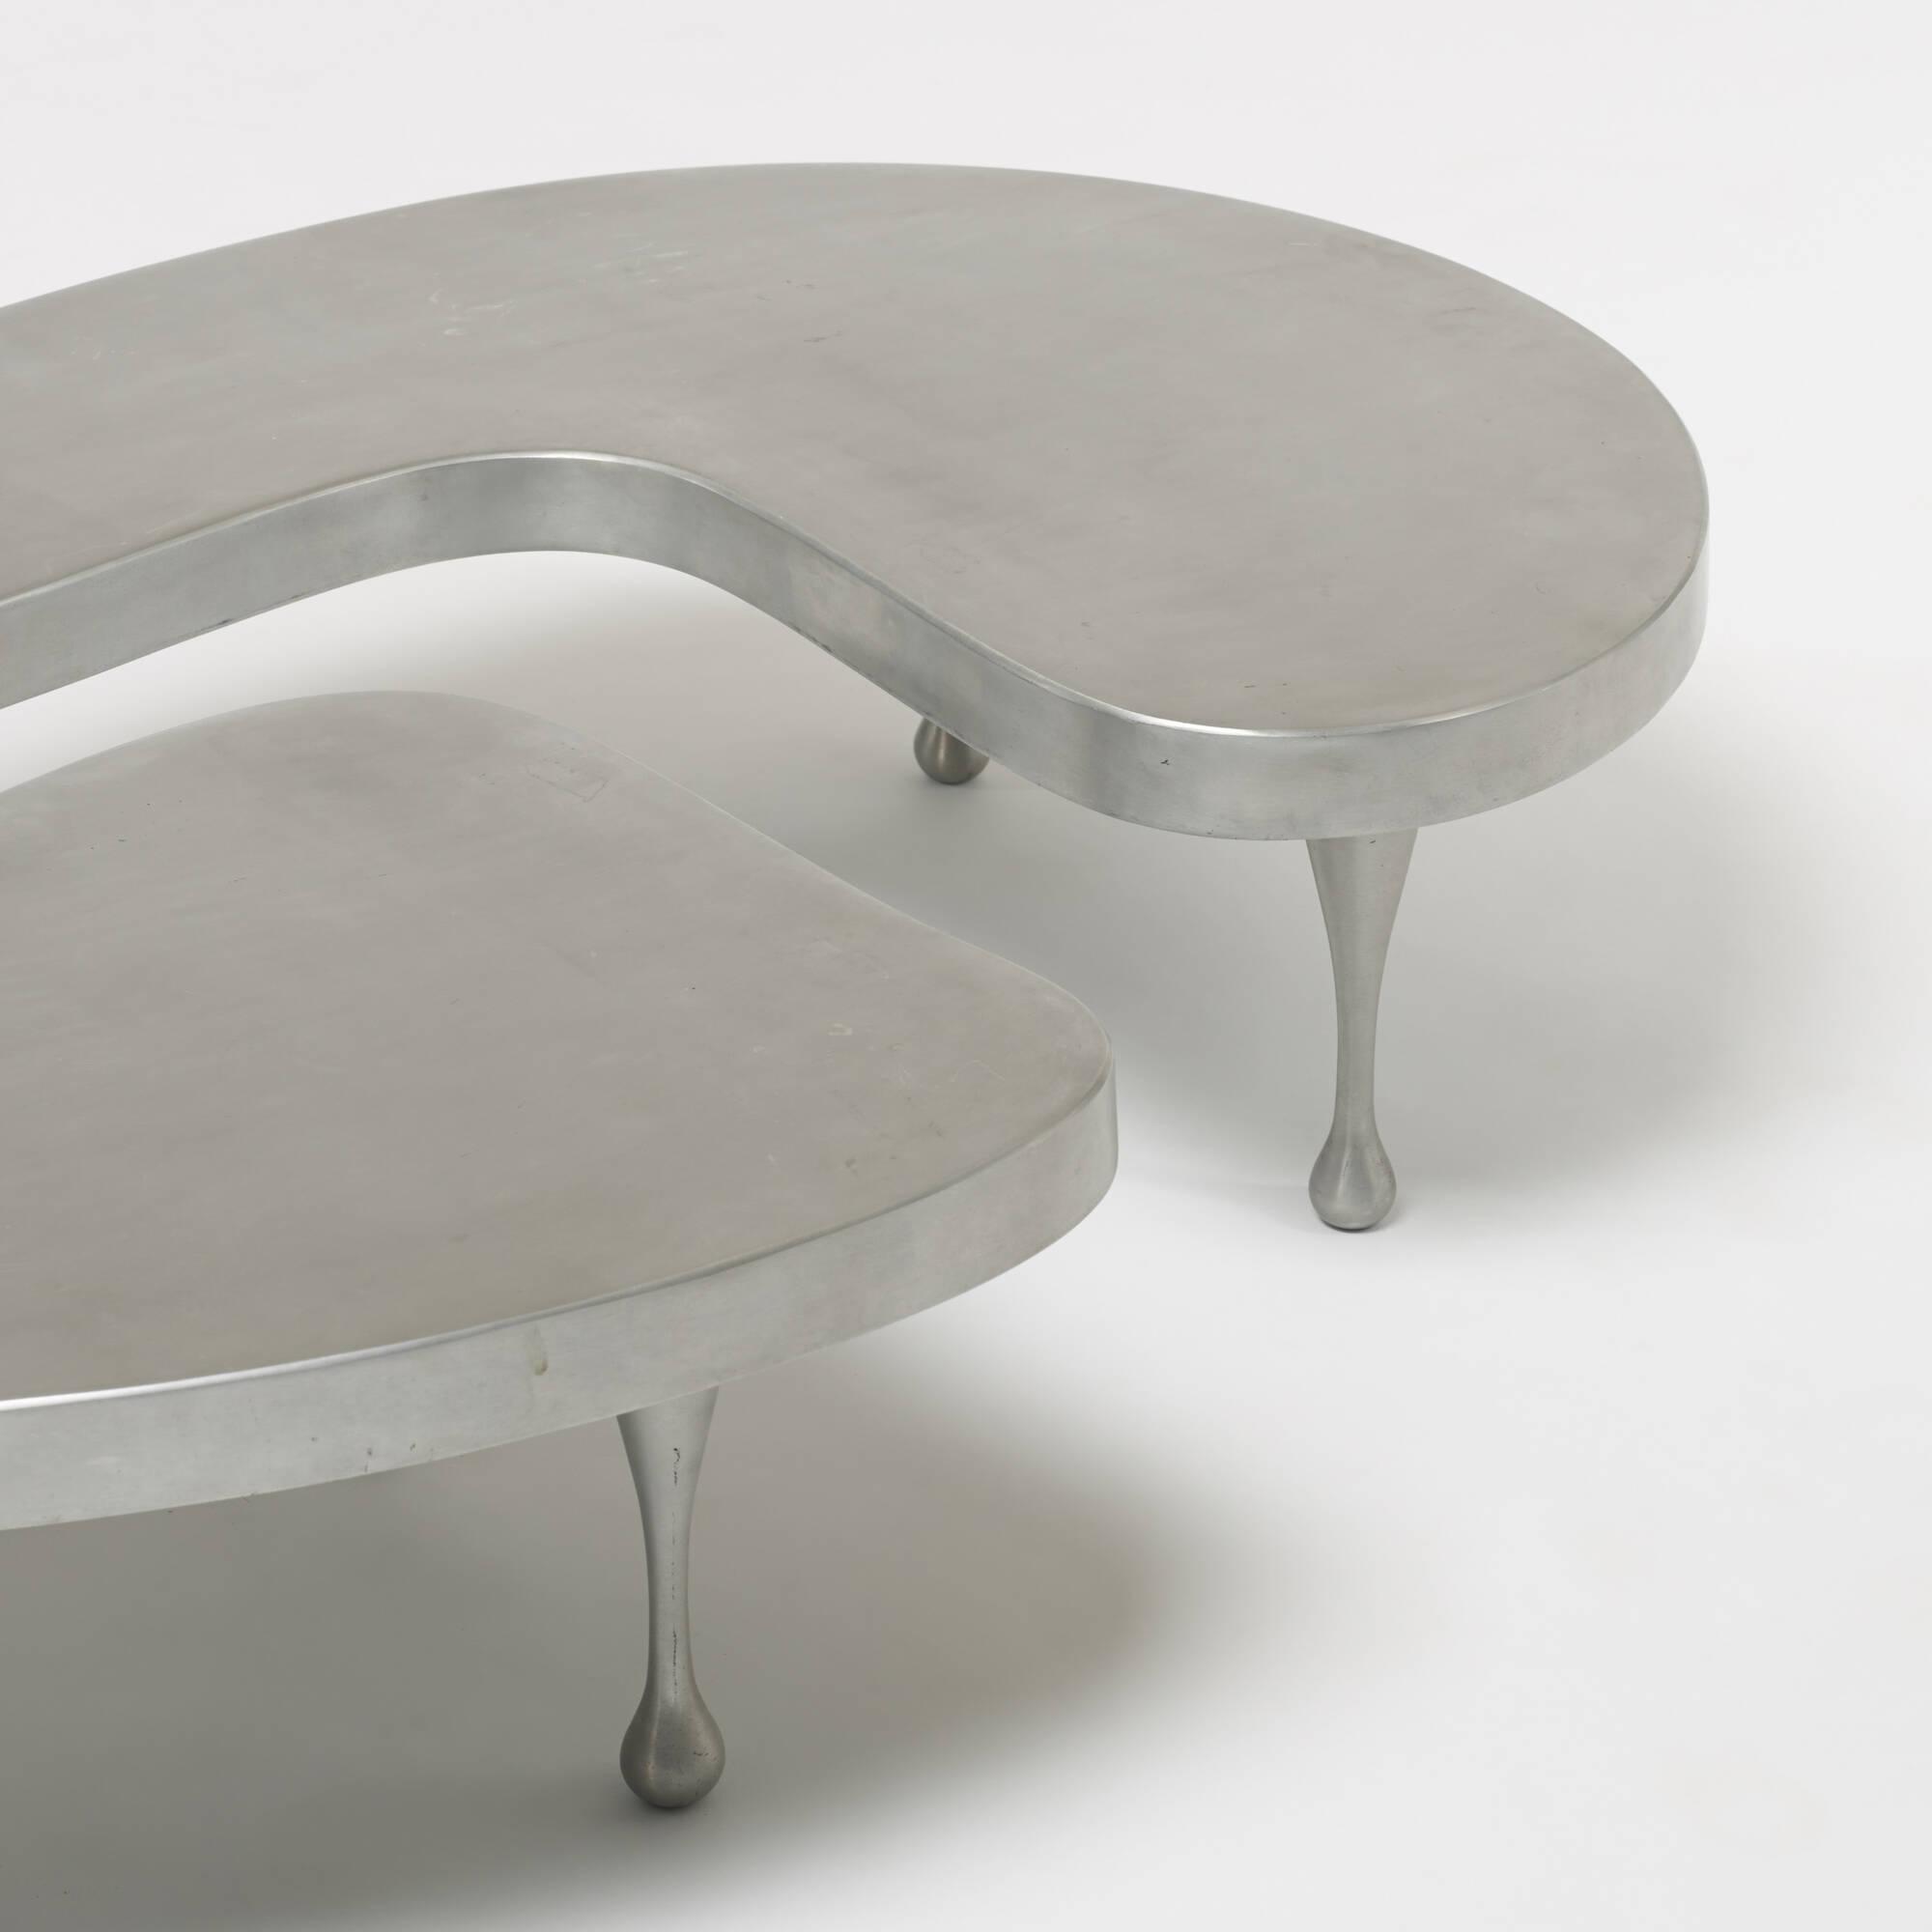 310: Frederick Kiesler / tables (5 of 7)